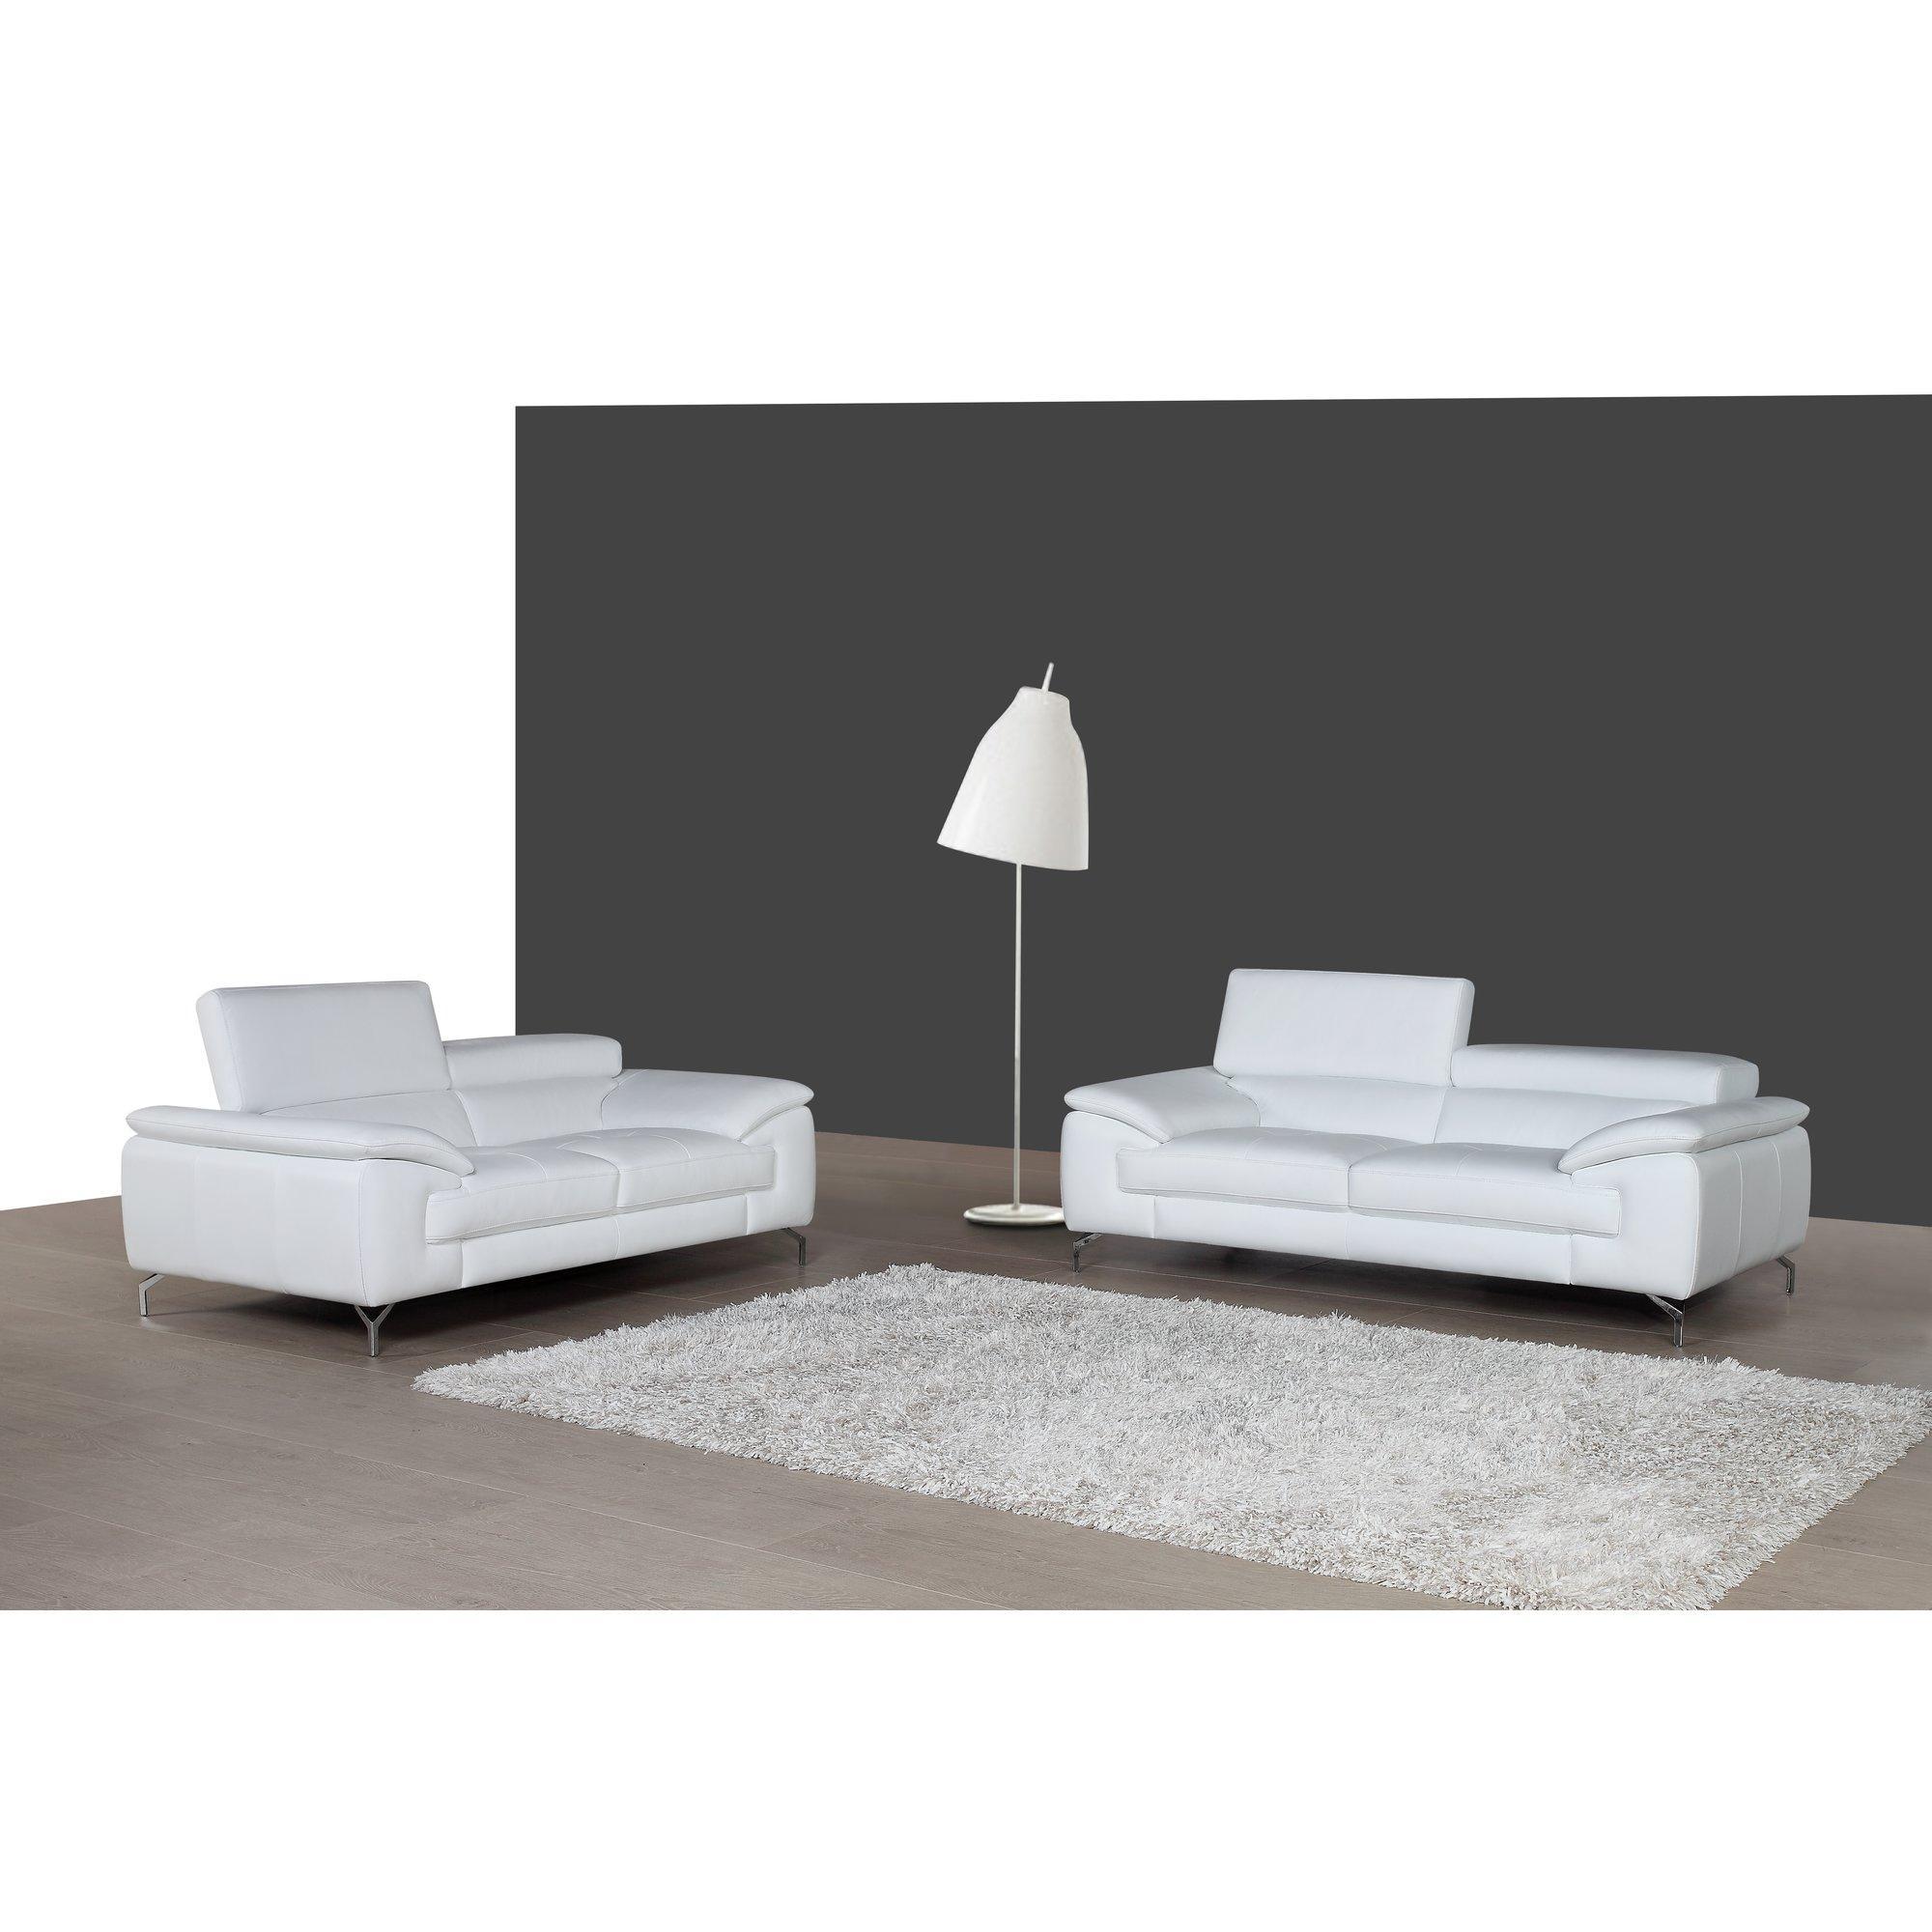 Wade Logan Gideon Italian Leather Sofa & Reviews | Wayfair Supply With Italian Leather Sofas (View 19 of 20)